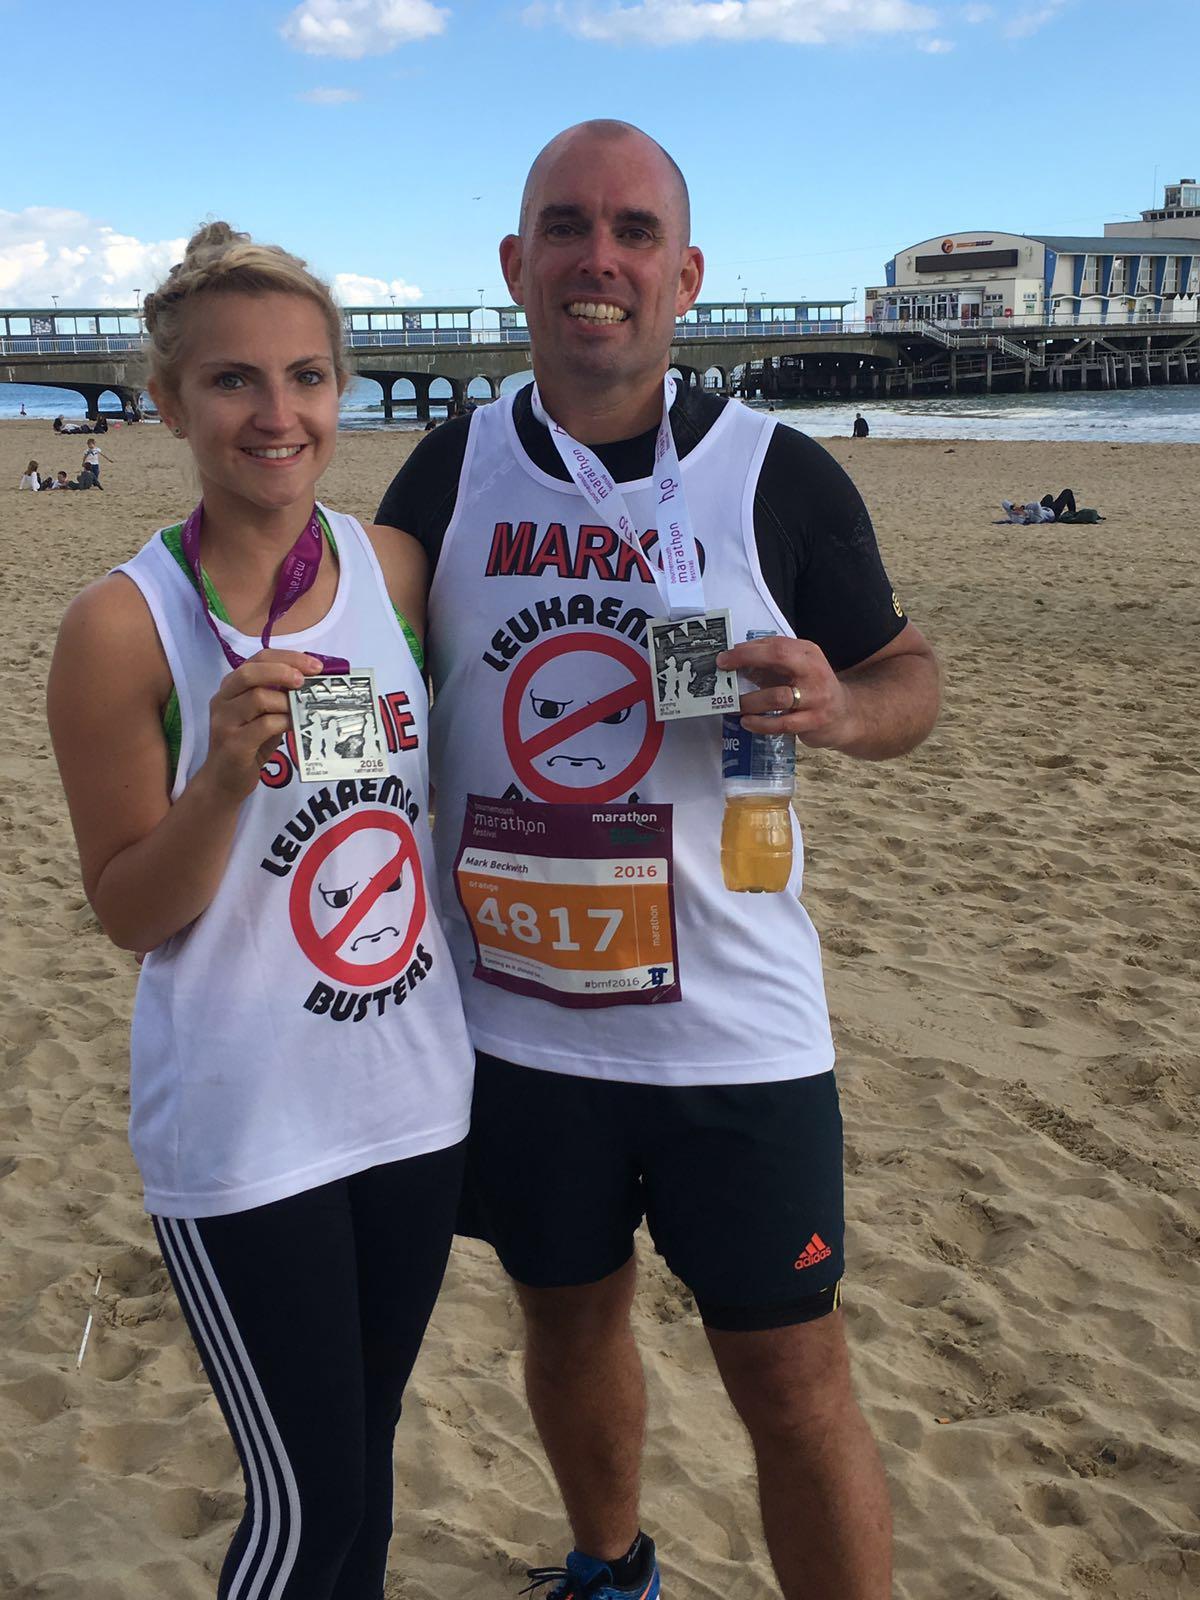 The Bournemouth Marathon